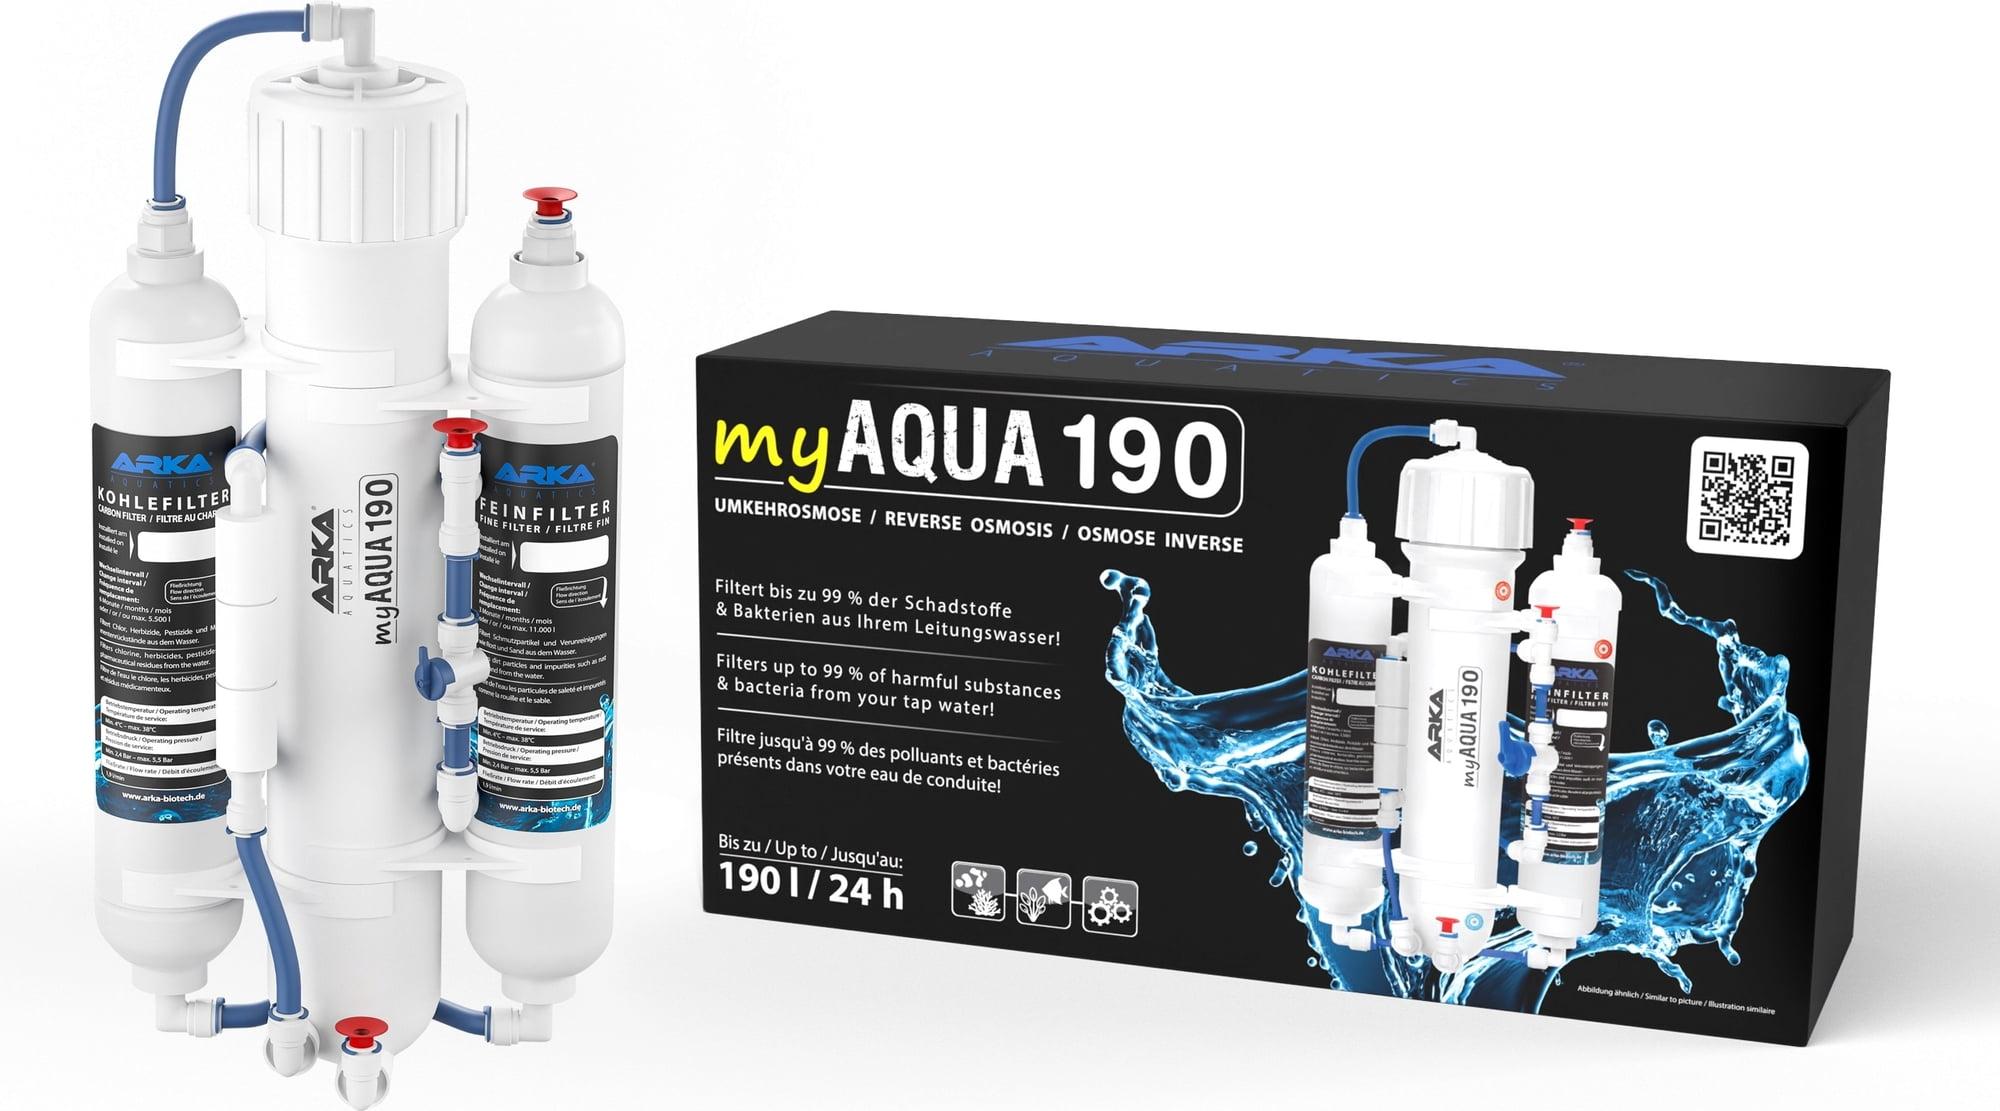 ARKA myAqua190 - Umkehrosmoseanlage bis zu 190 l/Tag